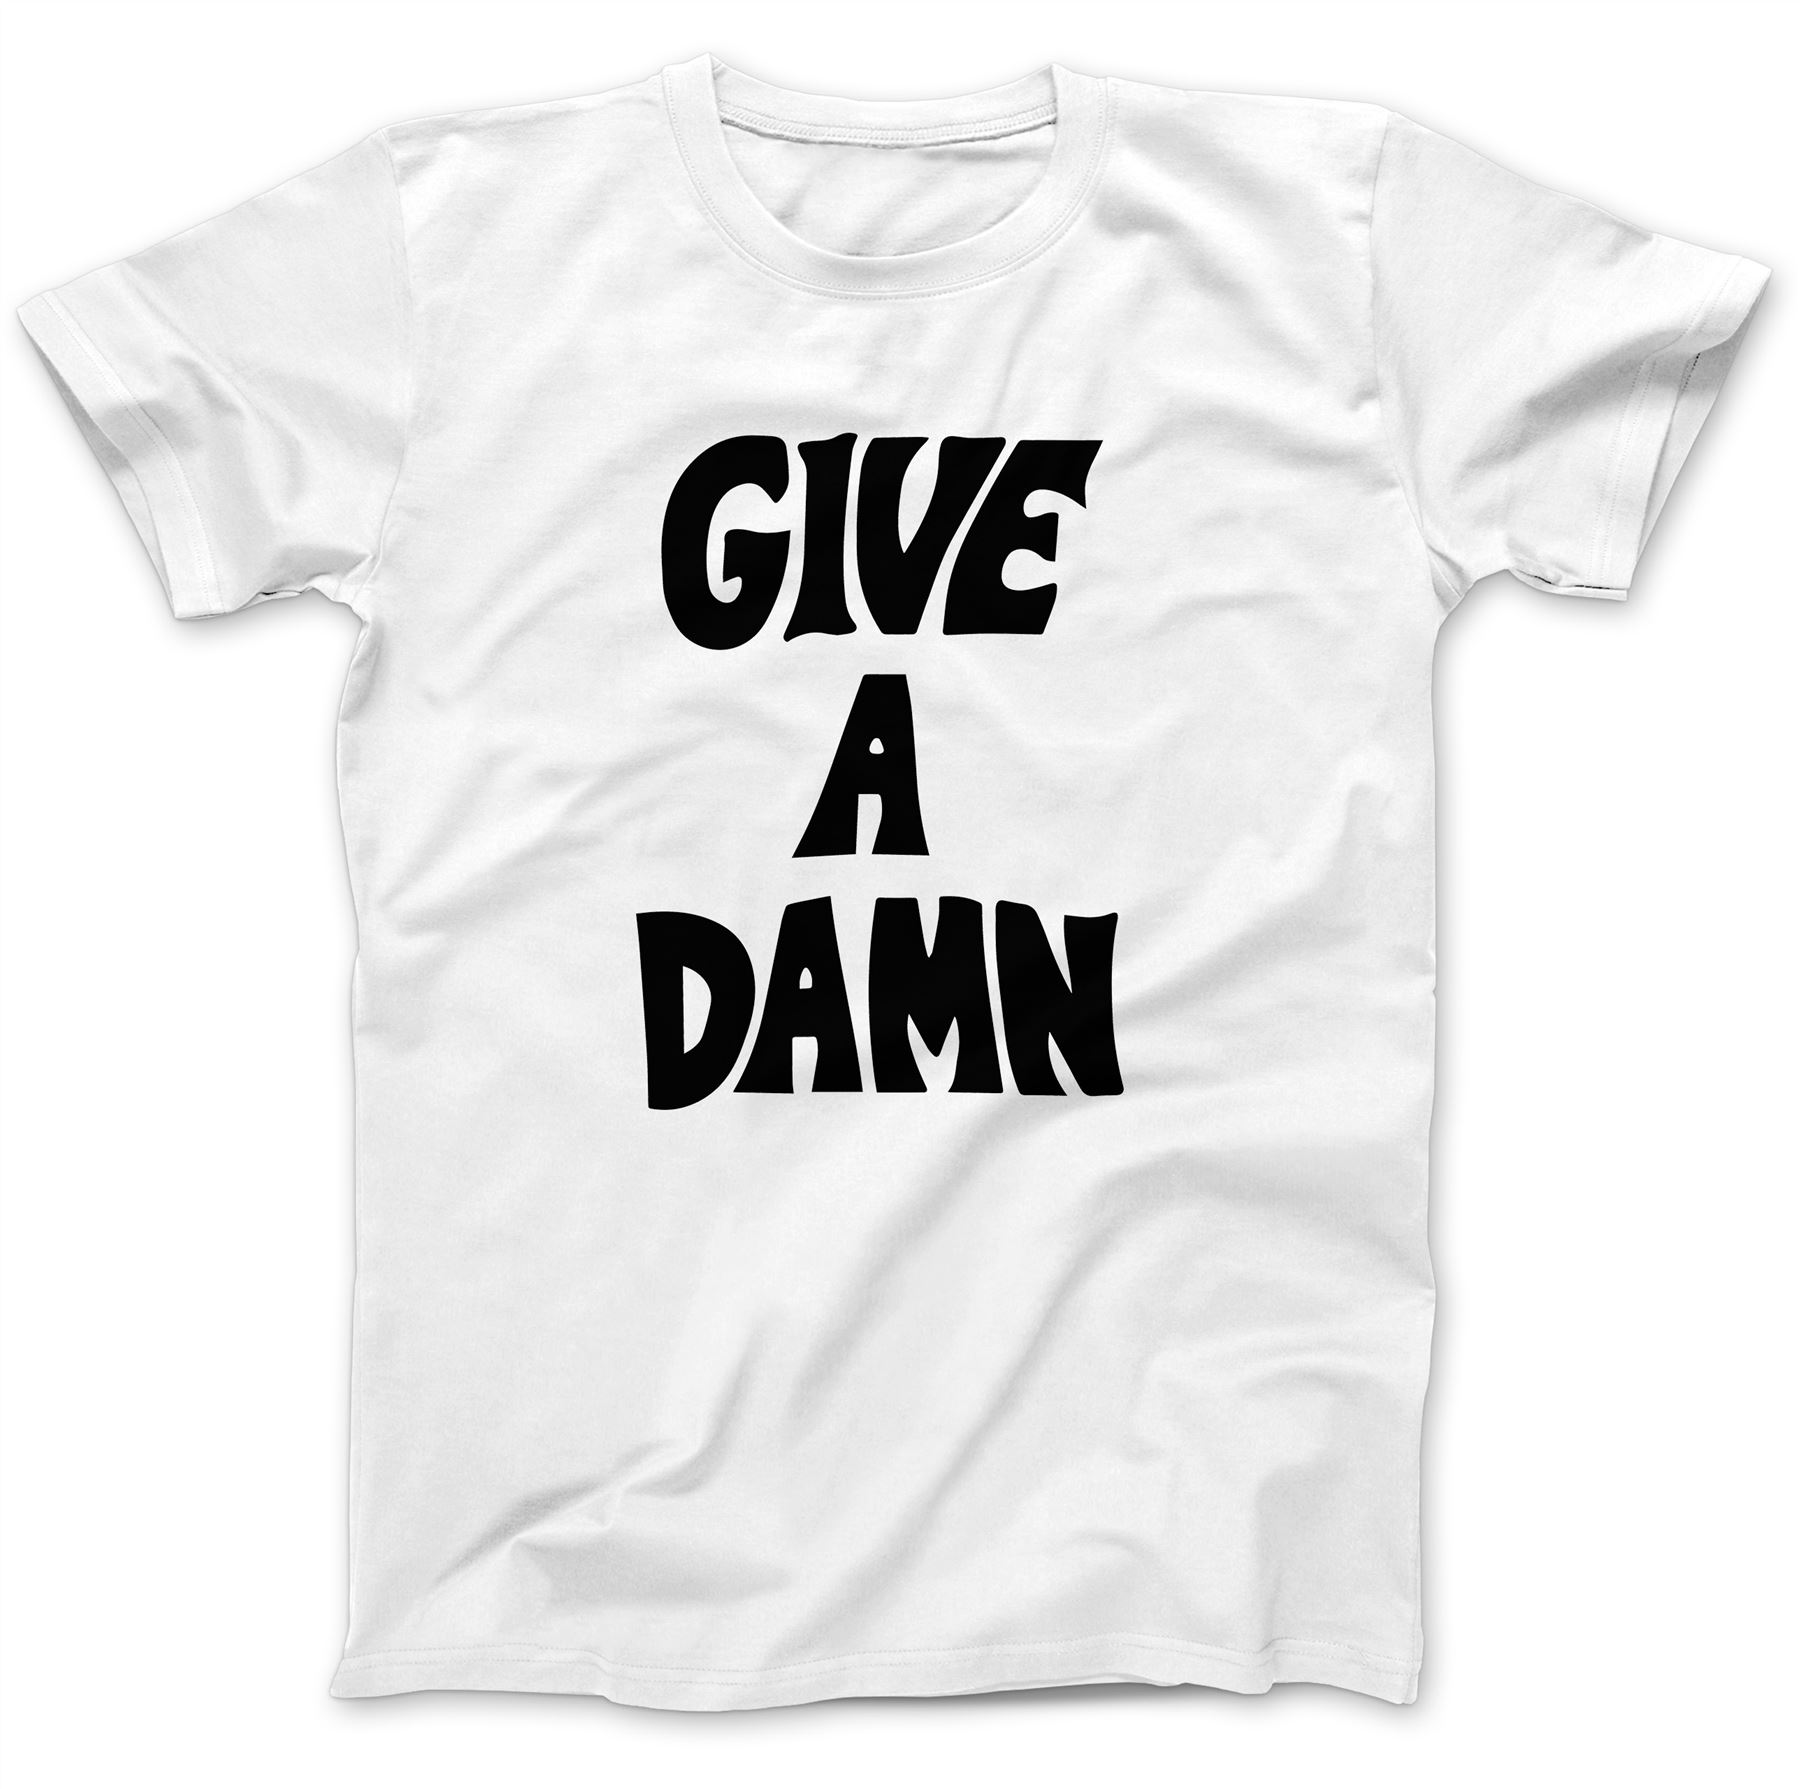 Give-A-Damn-As-Worn-By-Alex-Turner-T-Shirt-100-Premium-Cotton-Music-Gift miniatuur 11